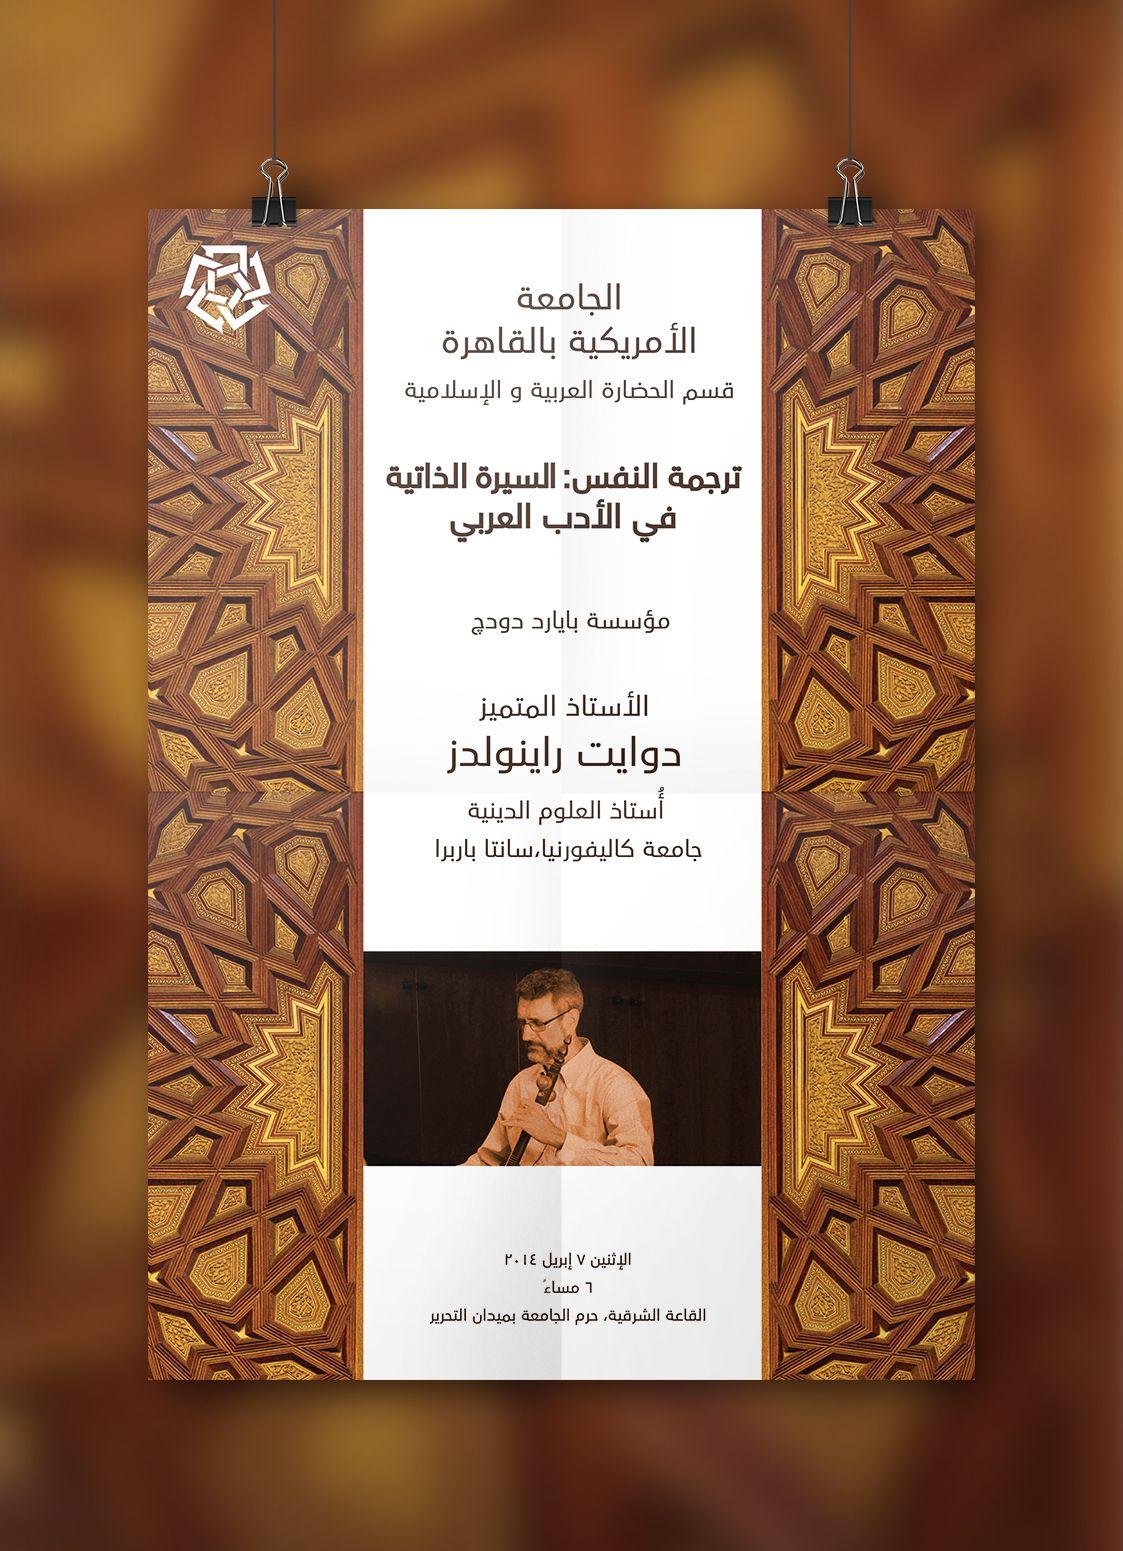 Cleveland Bayard Dodge Foundation Poster System Namatakom نمطكم Arabgraphicdesign Branding Postersystem Academi Branding Corporate Identity Logo Design